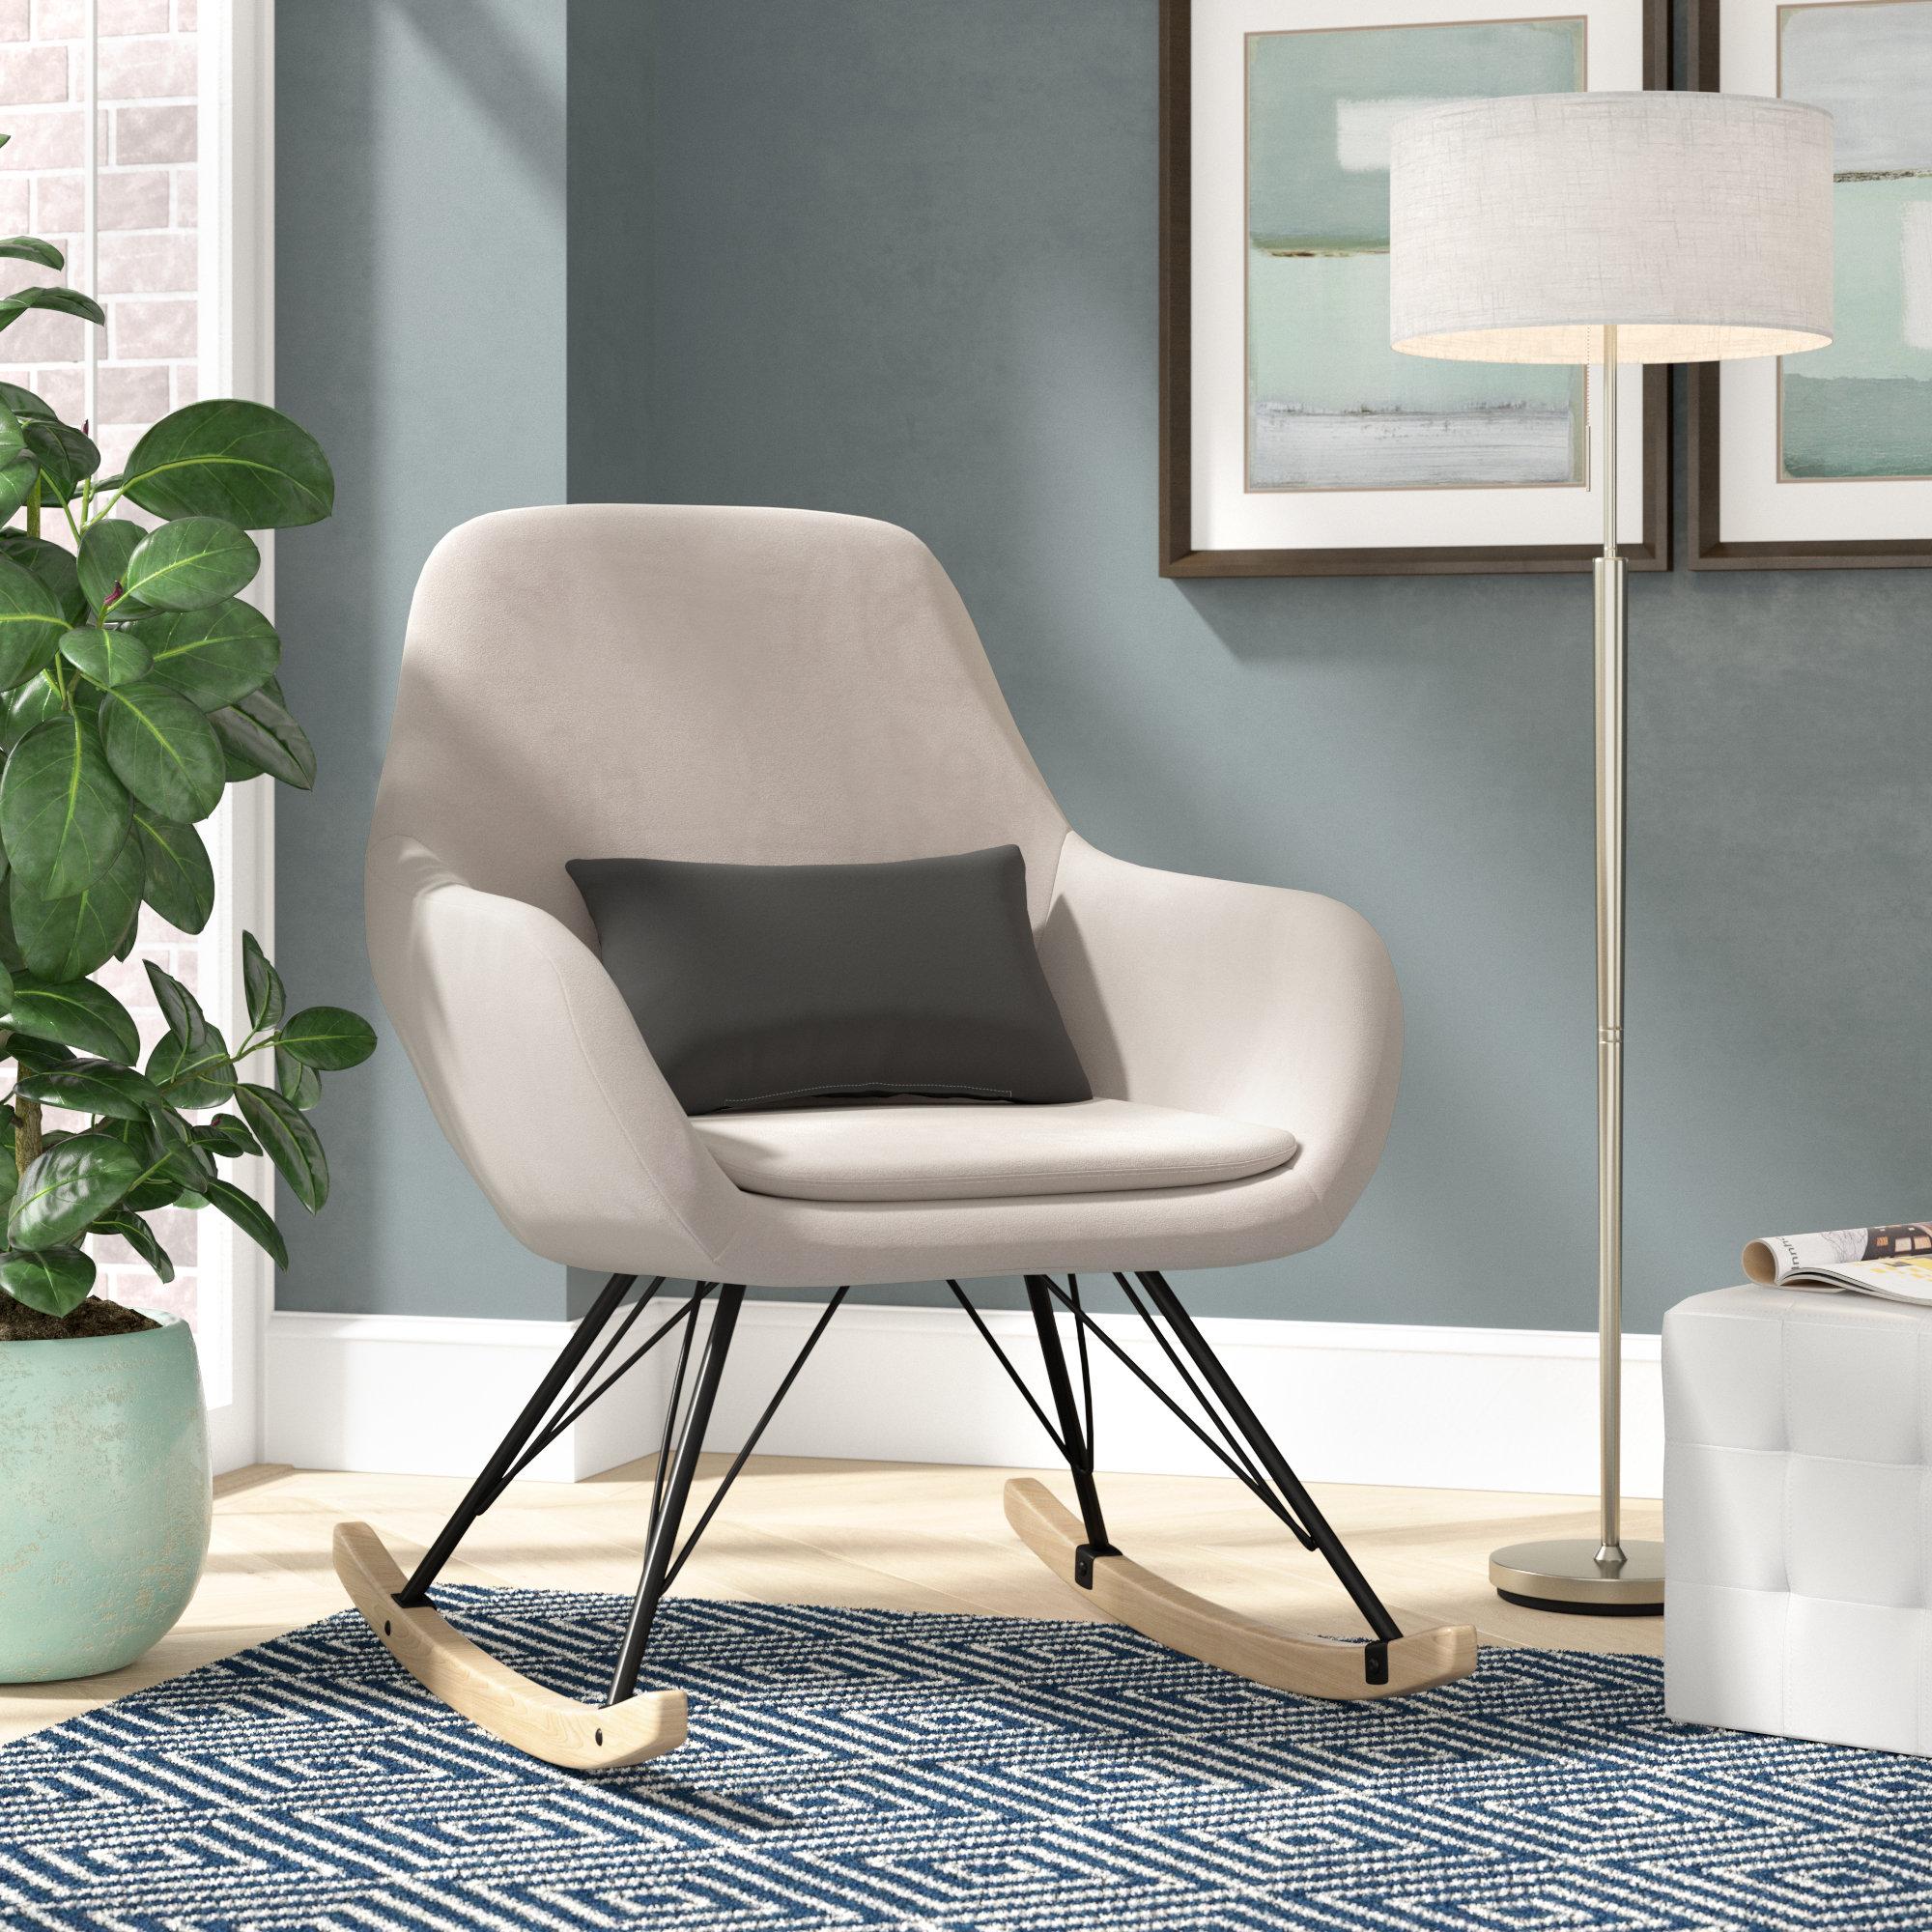 Brayden Studio Decker Rocking Chair & Reviews | Wayfair Within Decker Ii Fabric Swivel Glider Recliners (View 17 of 25)